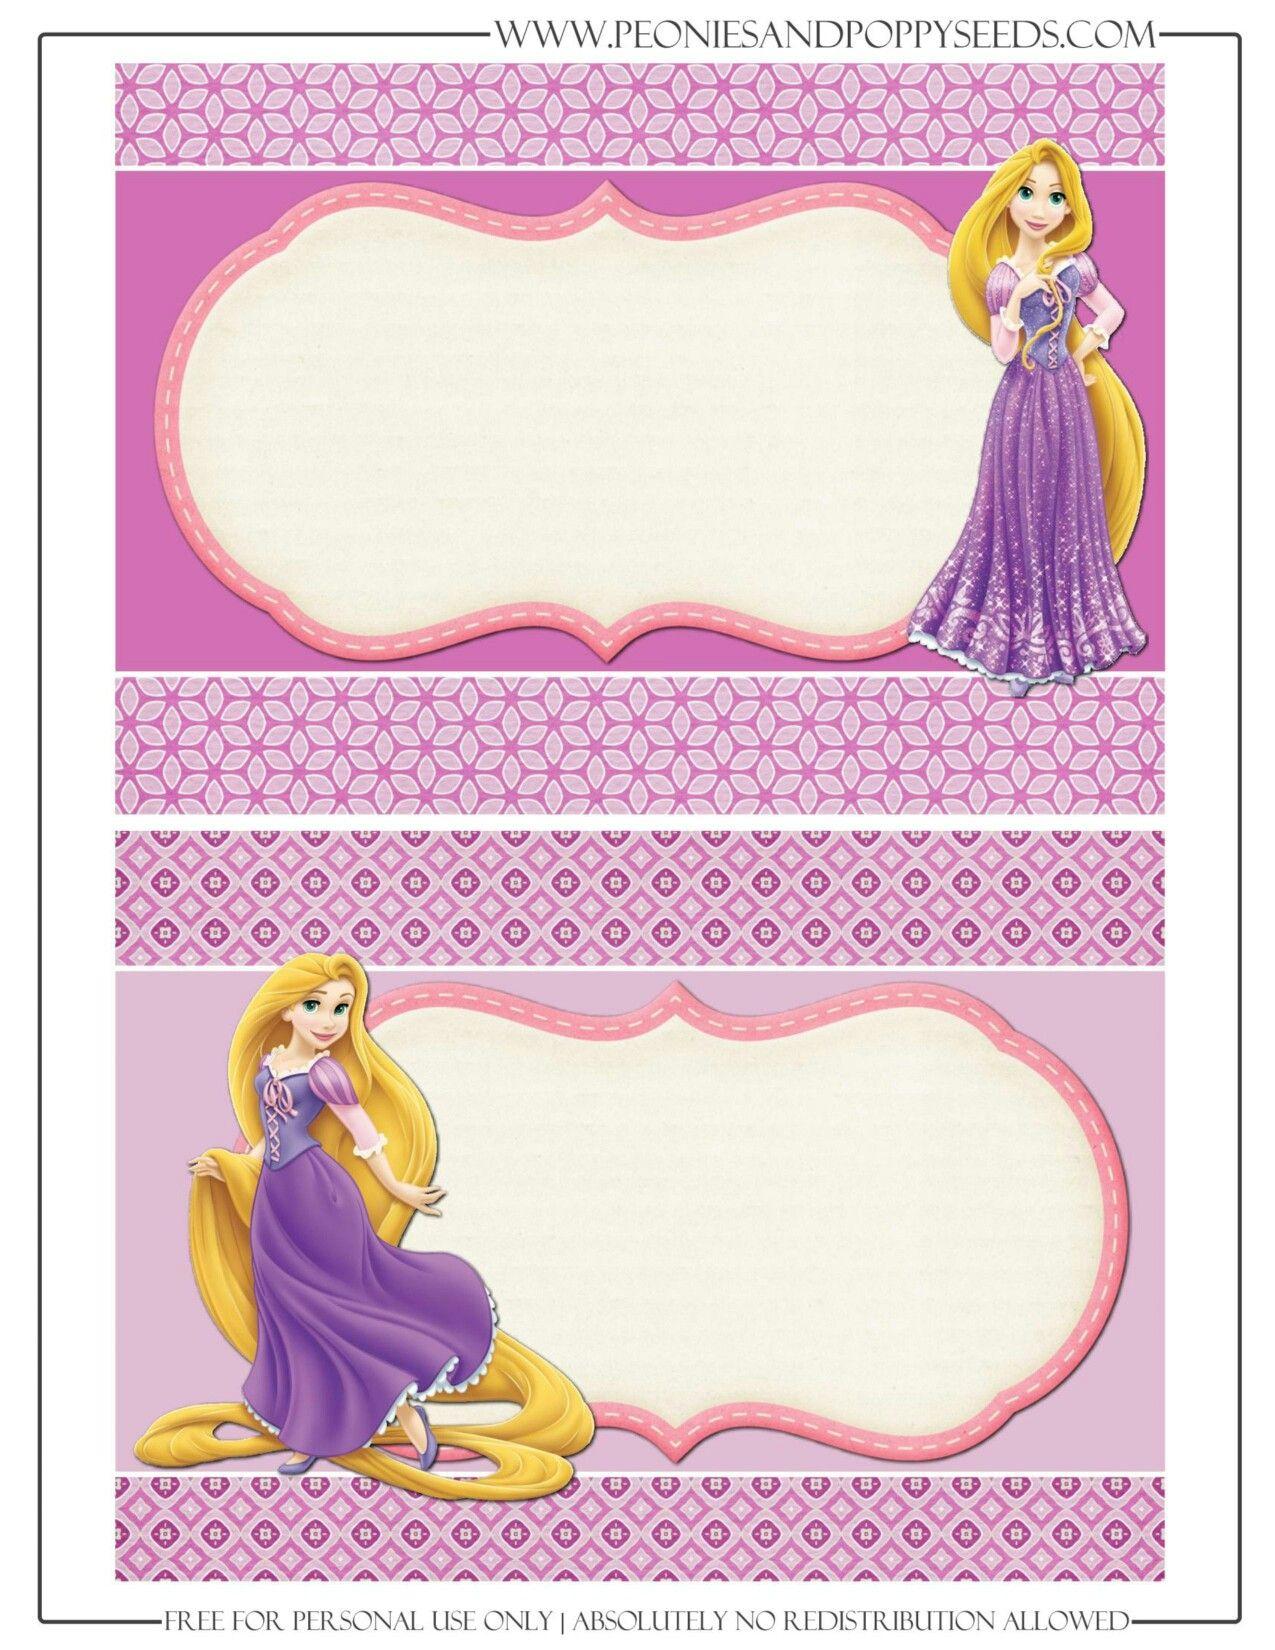 Invitación Rapunzel Invitaciones De Rapunzel Imprimibles